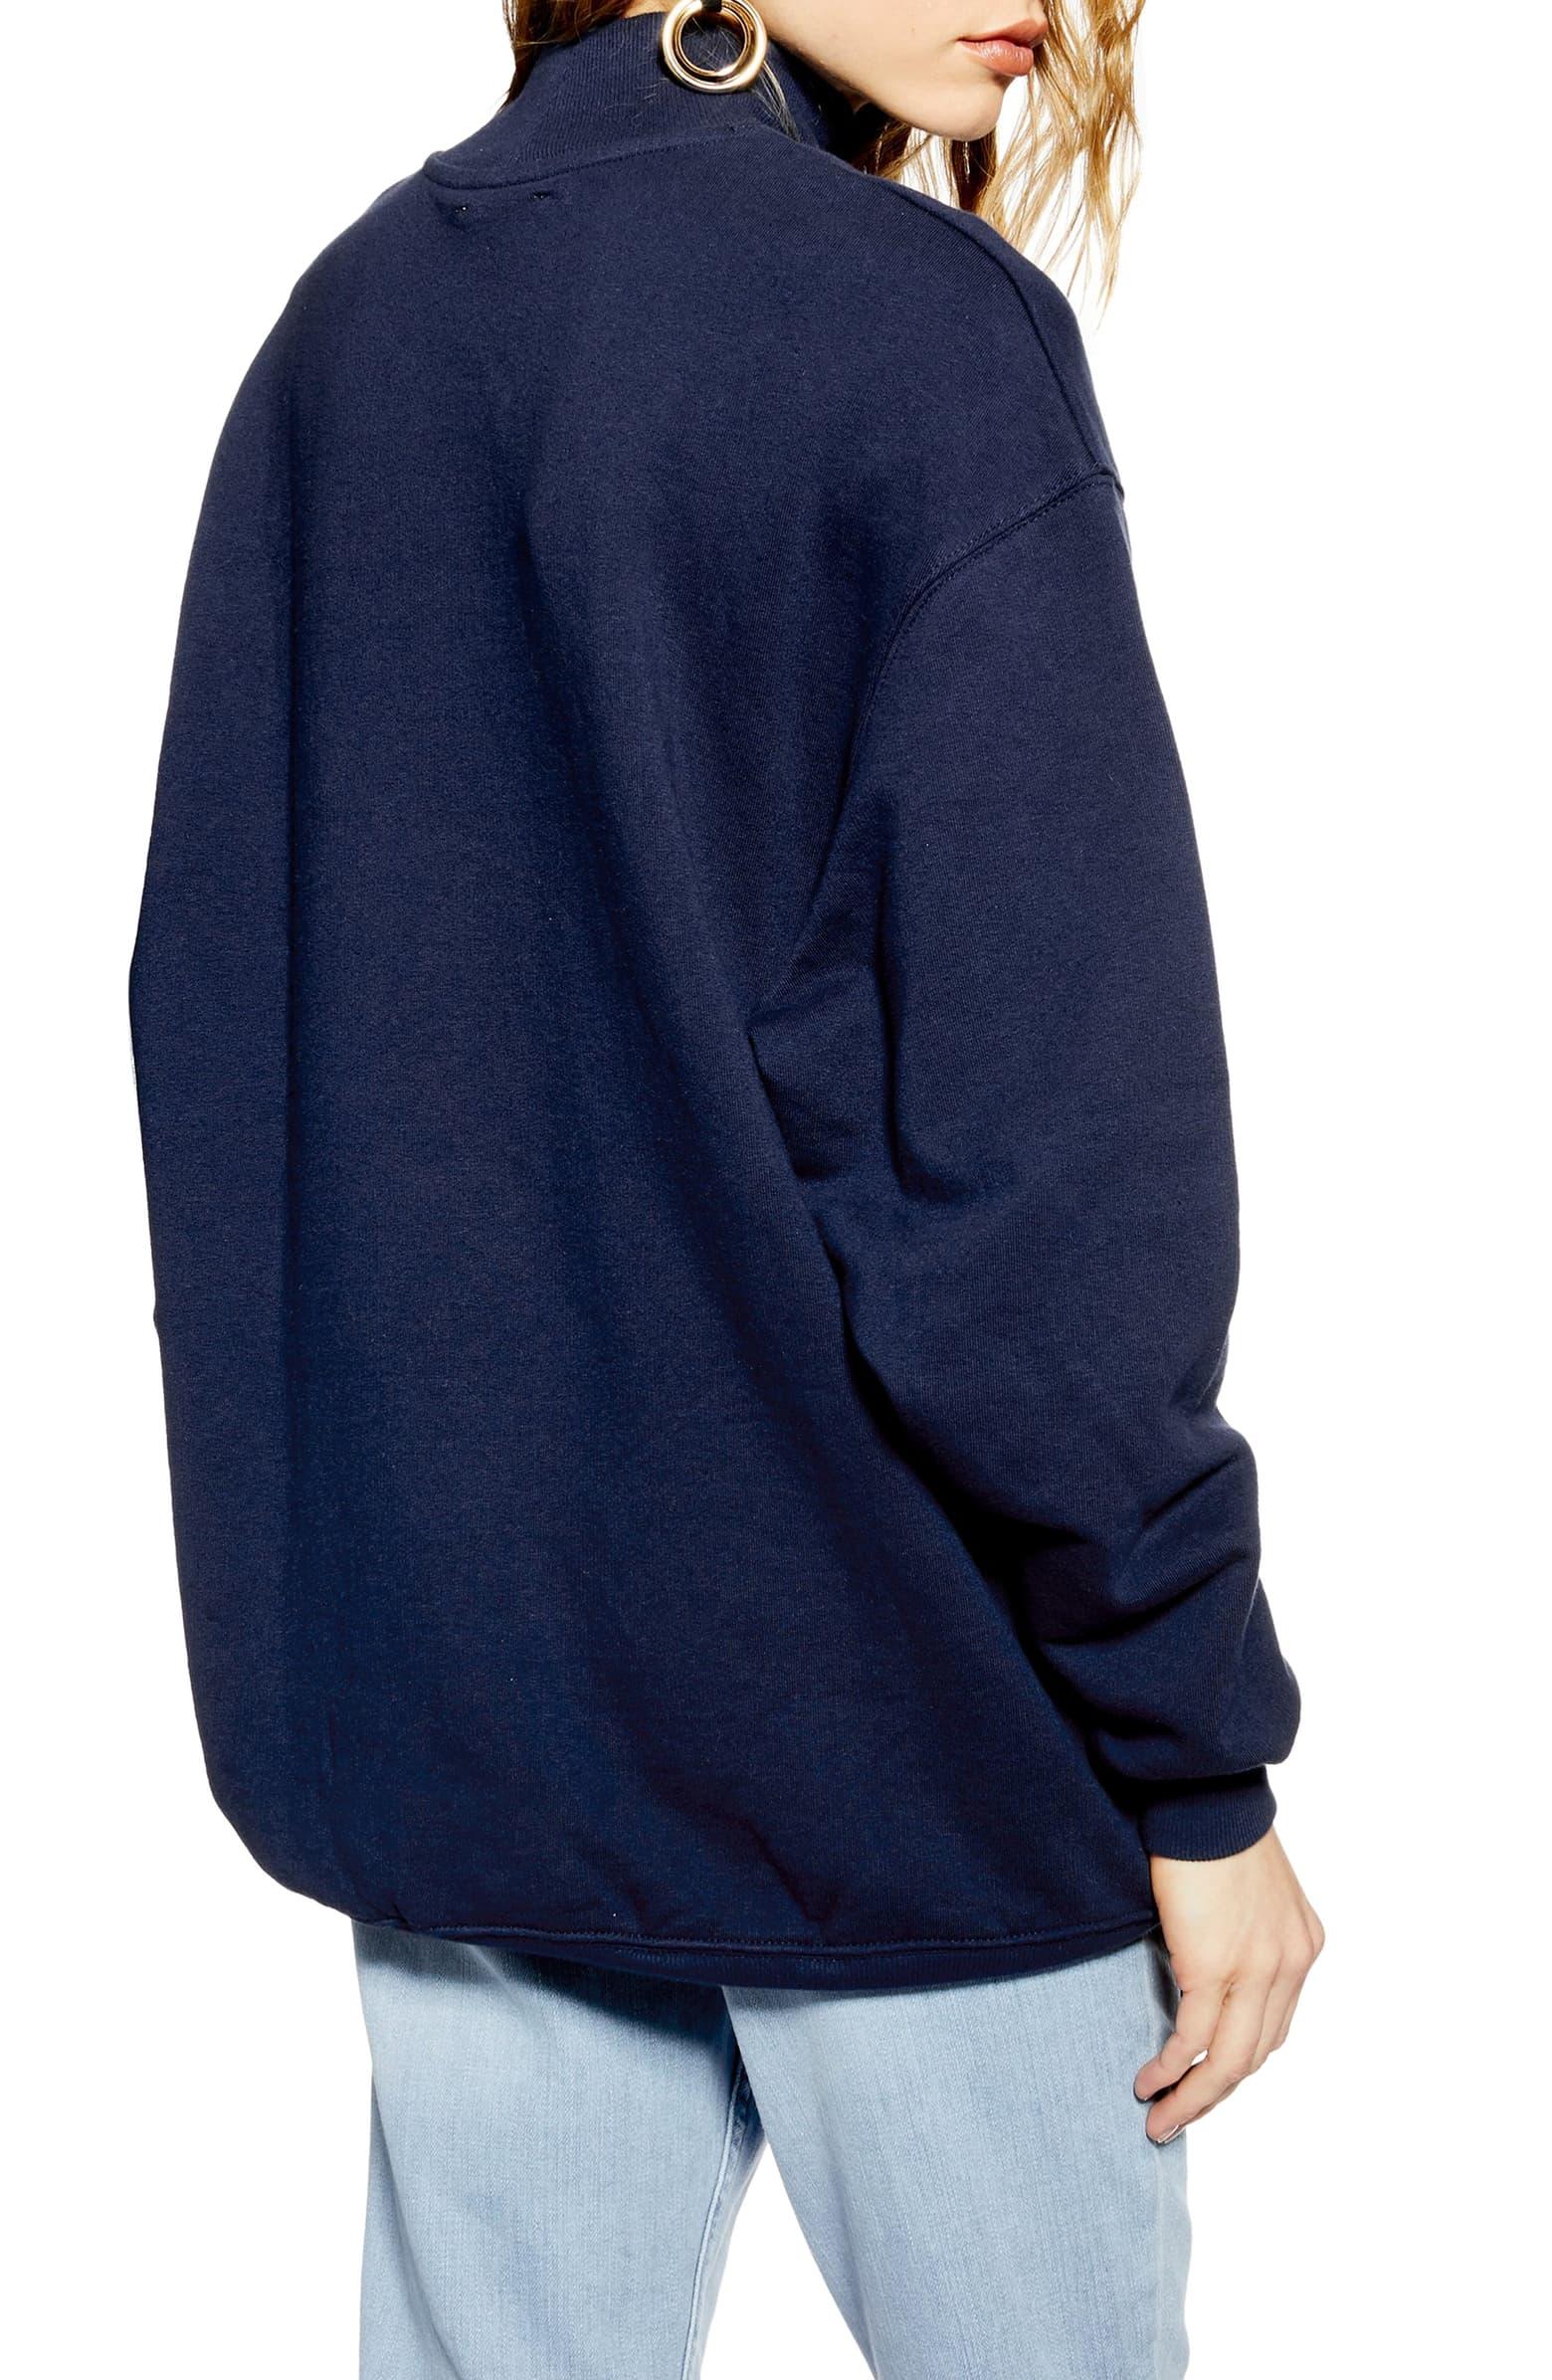 Oversized Mock Neck Sweatshirt by Topshop